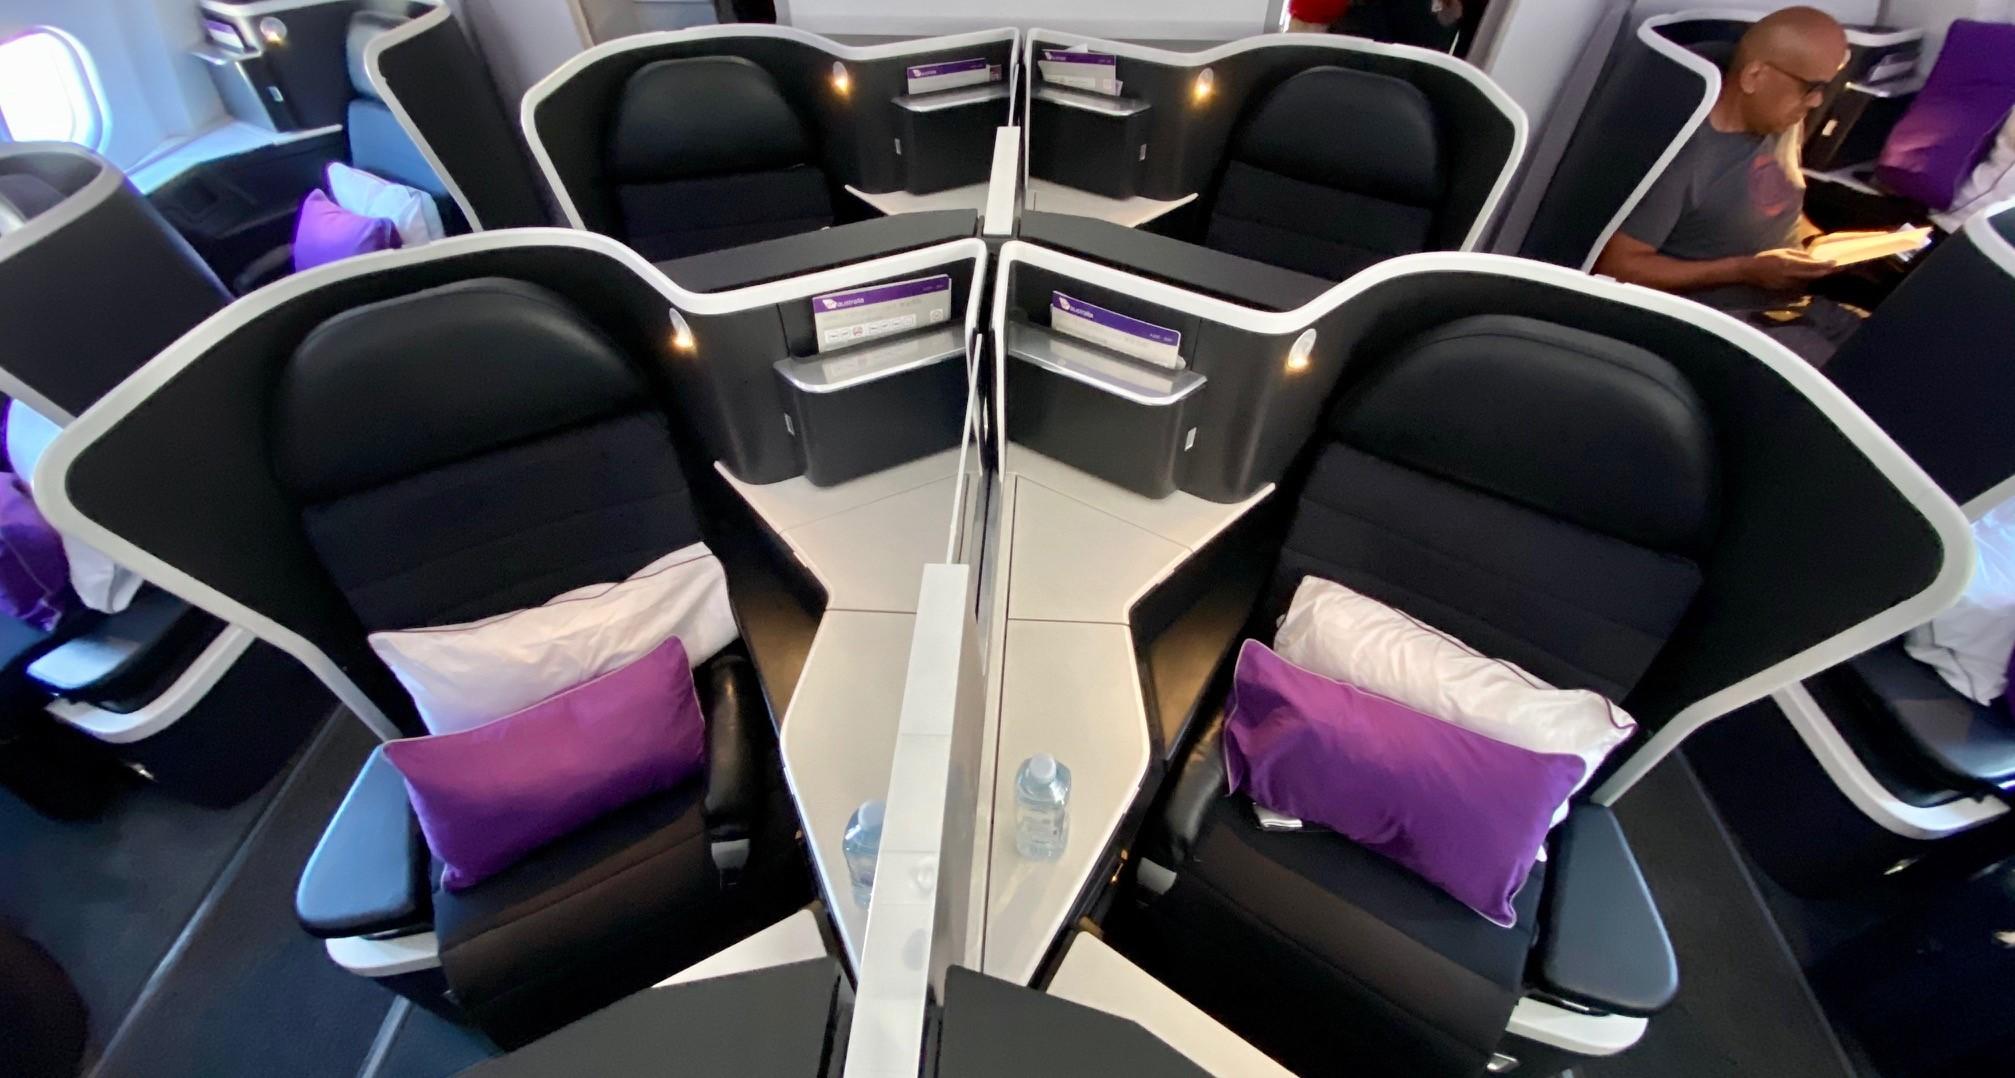 Virgin Australia A-330 Business Class, Middle Seats